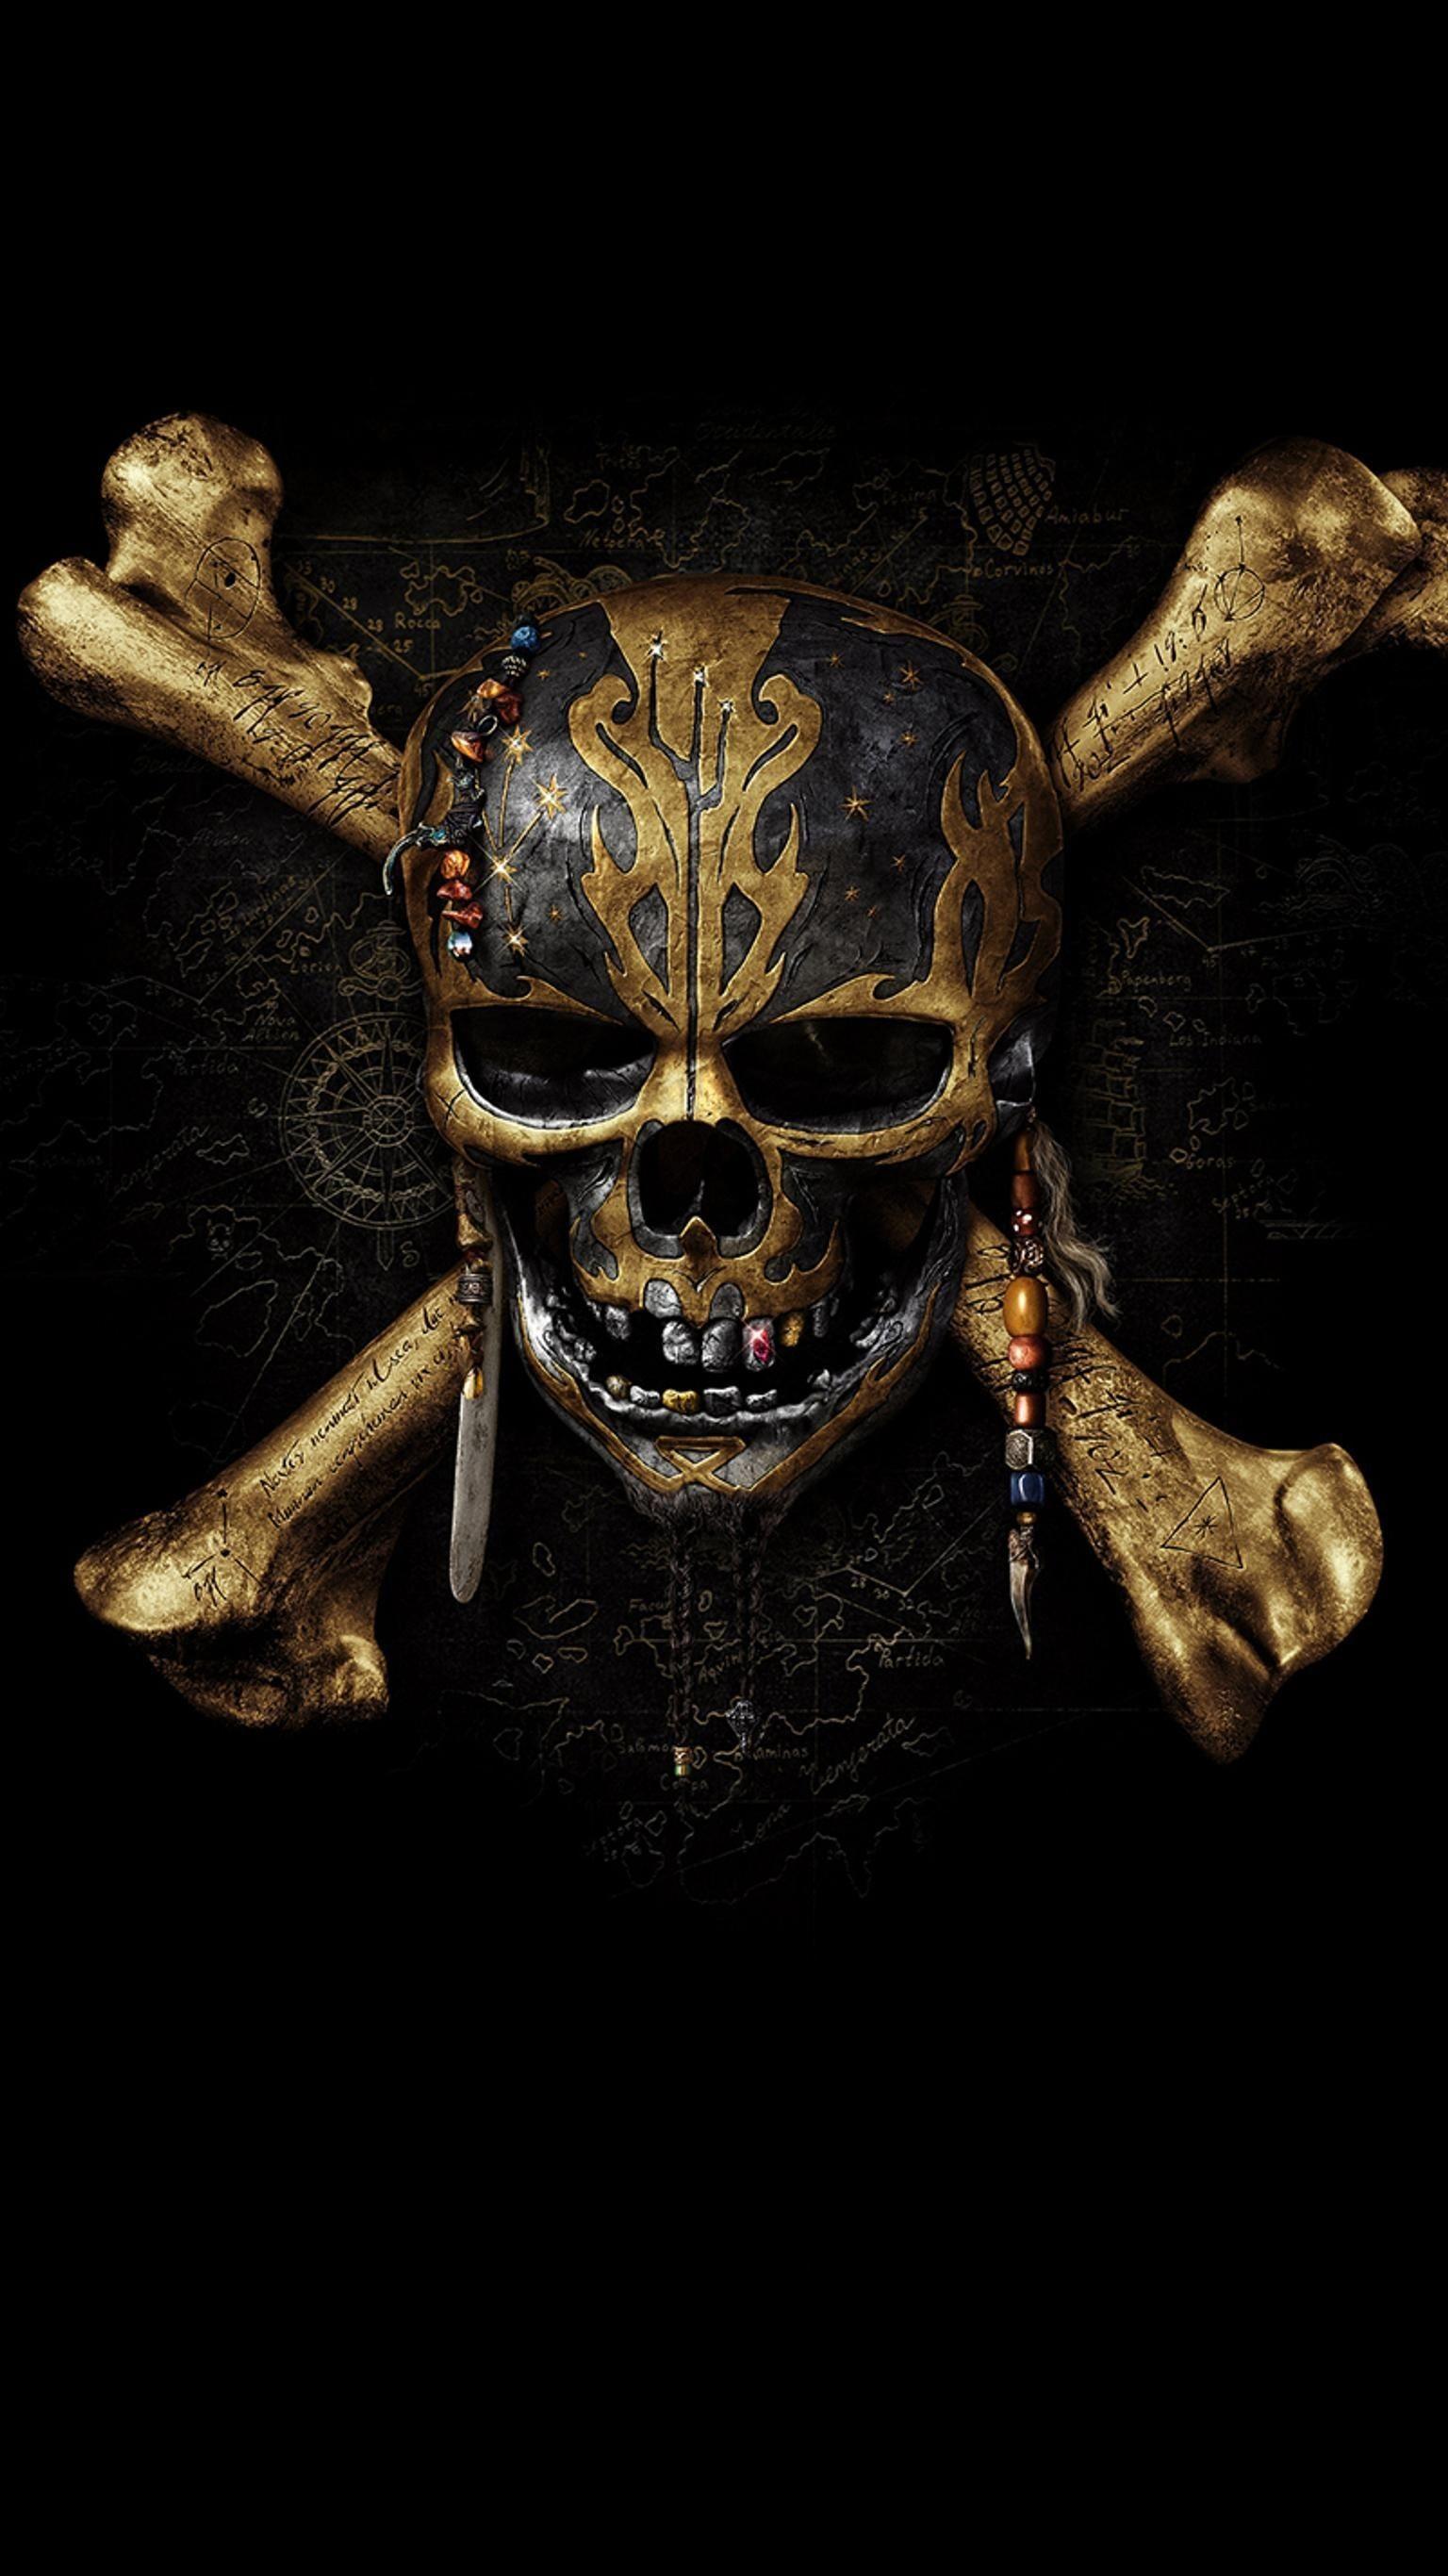 Fresh Pirates Of The Caribbean 5 Skull Wallpaper Skull Wallpaper Pirate Art Pirate Skull Tattoos